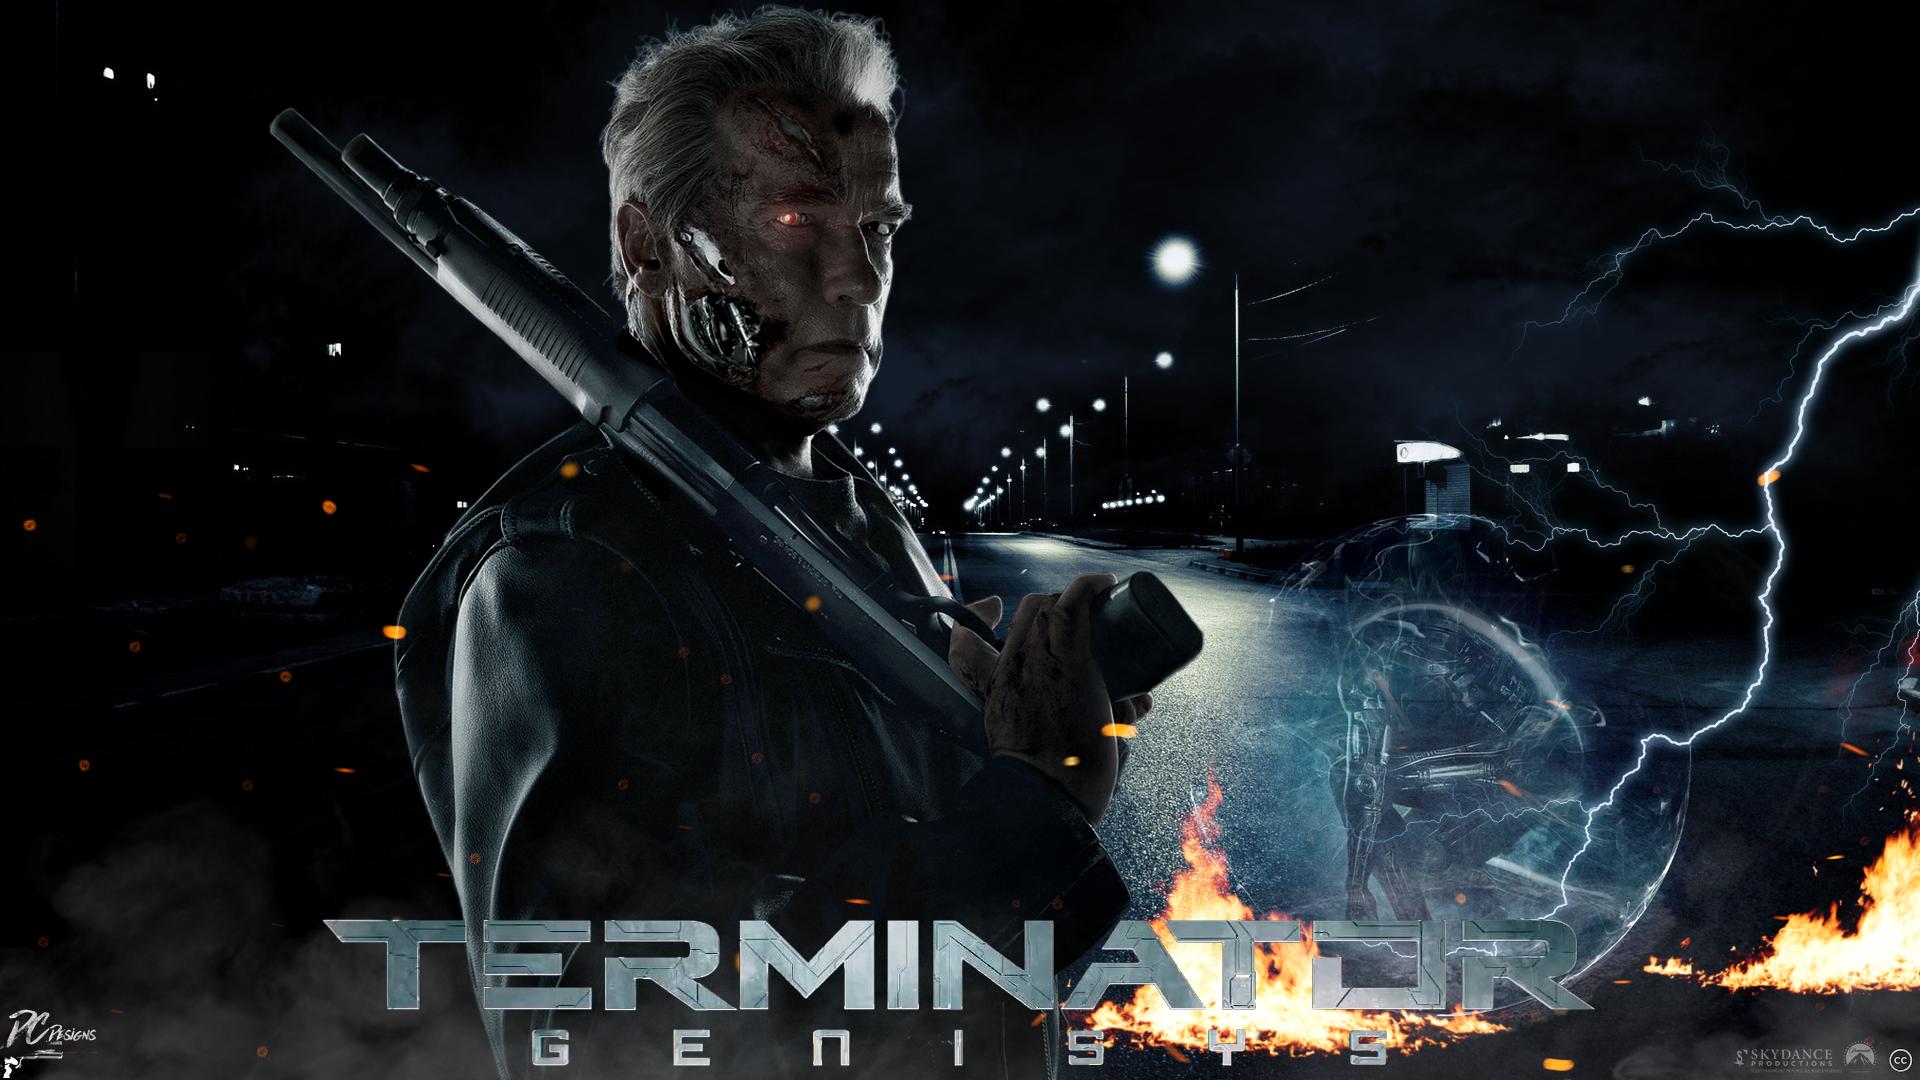 Terminator genisys hd wallpaper background image 1920x1080 id 589554 wallpaper abyss - Terminator 2 wallpaper hd ...